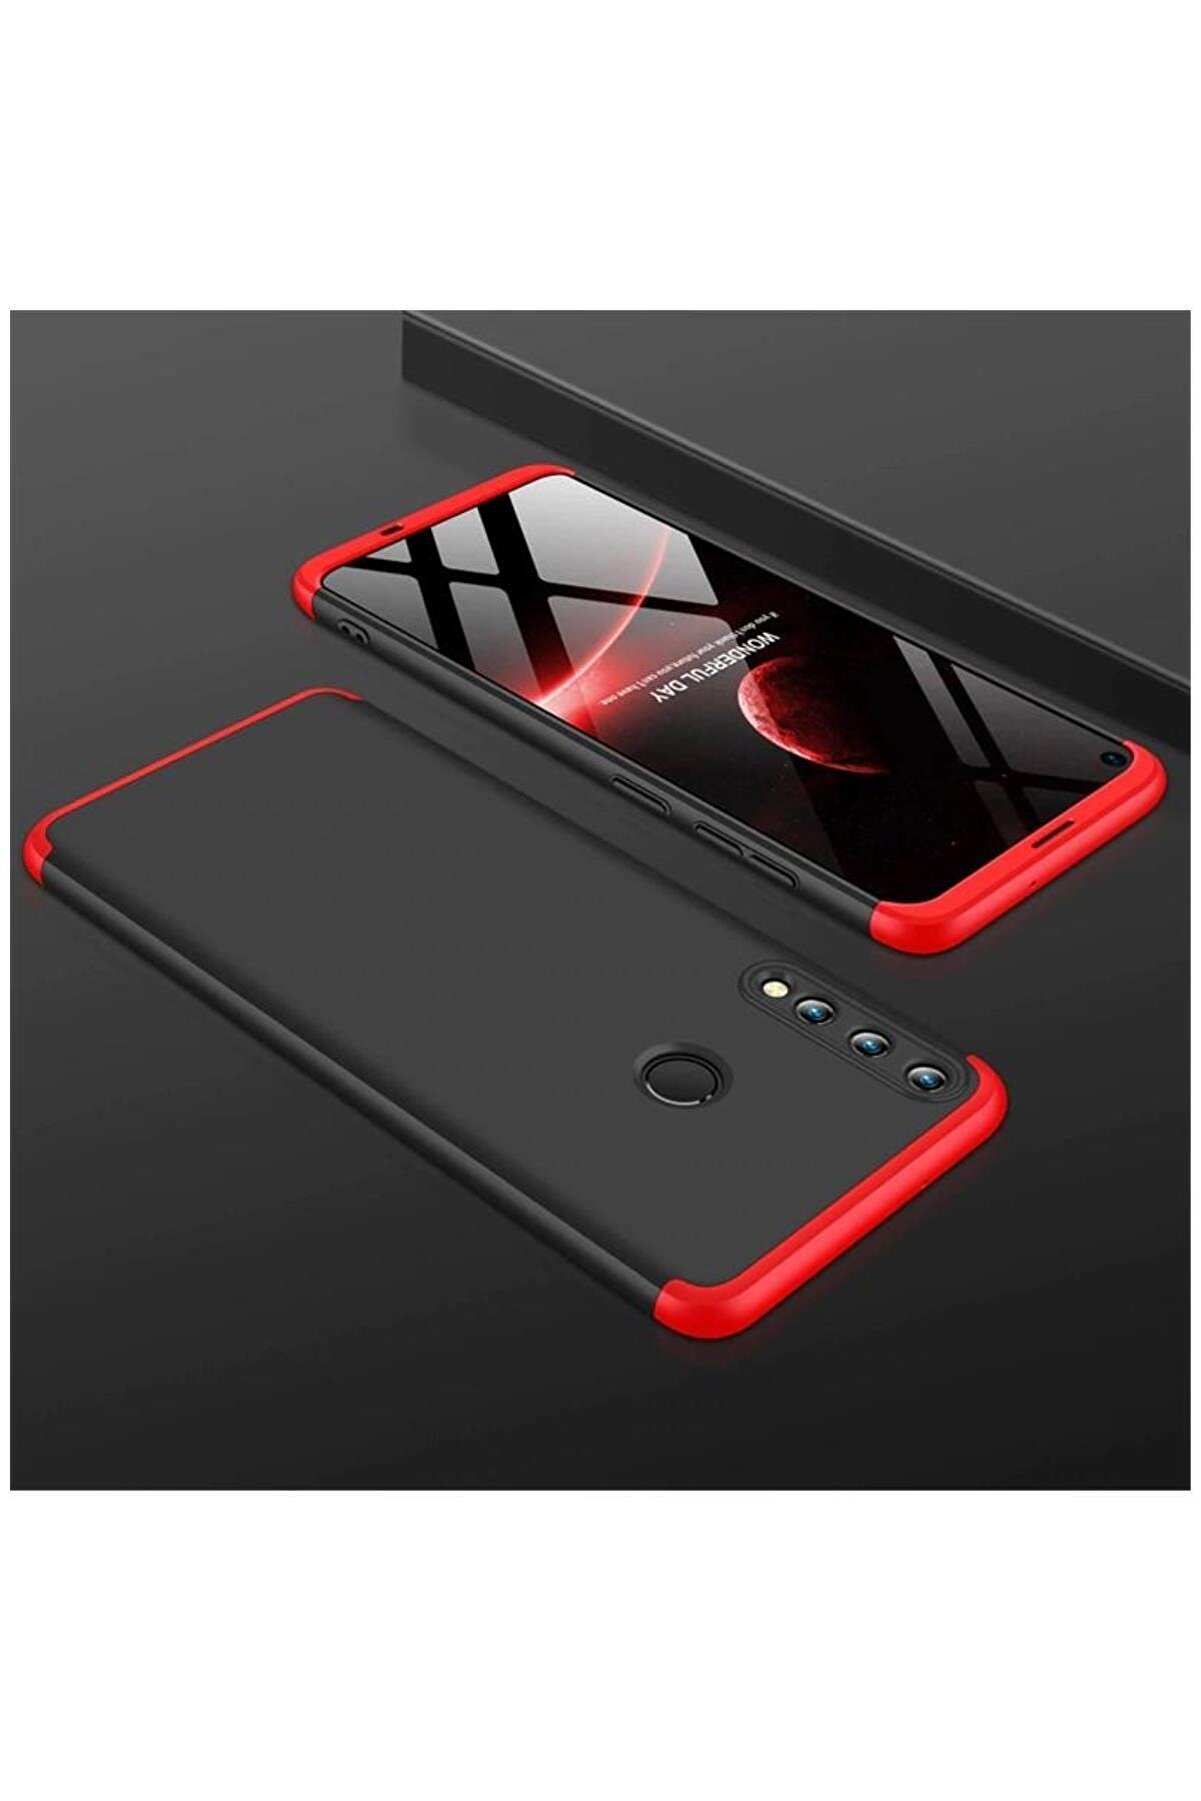 Dara Aksesuar Huawei P40 Lite E Kılıf New 360 Derece Tam Koruma Kılıf Siyah + Kırmızı